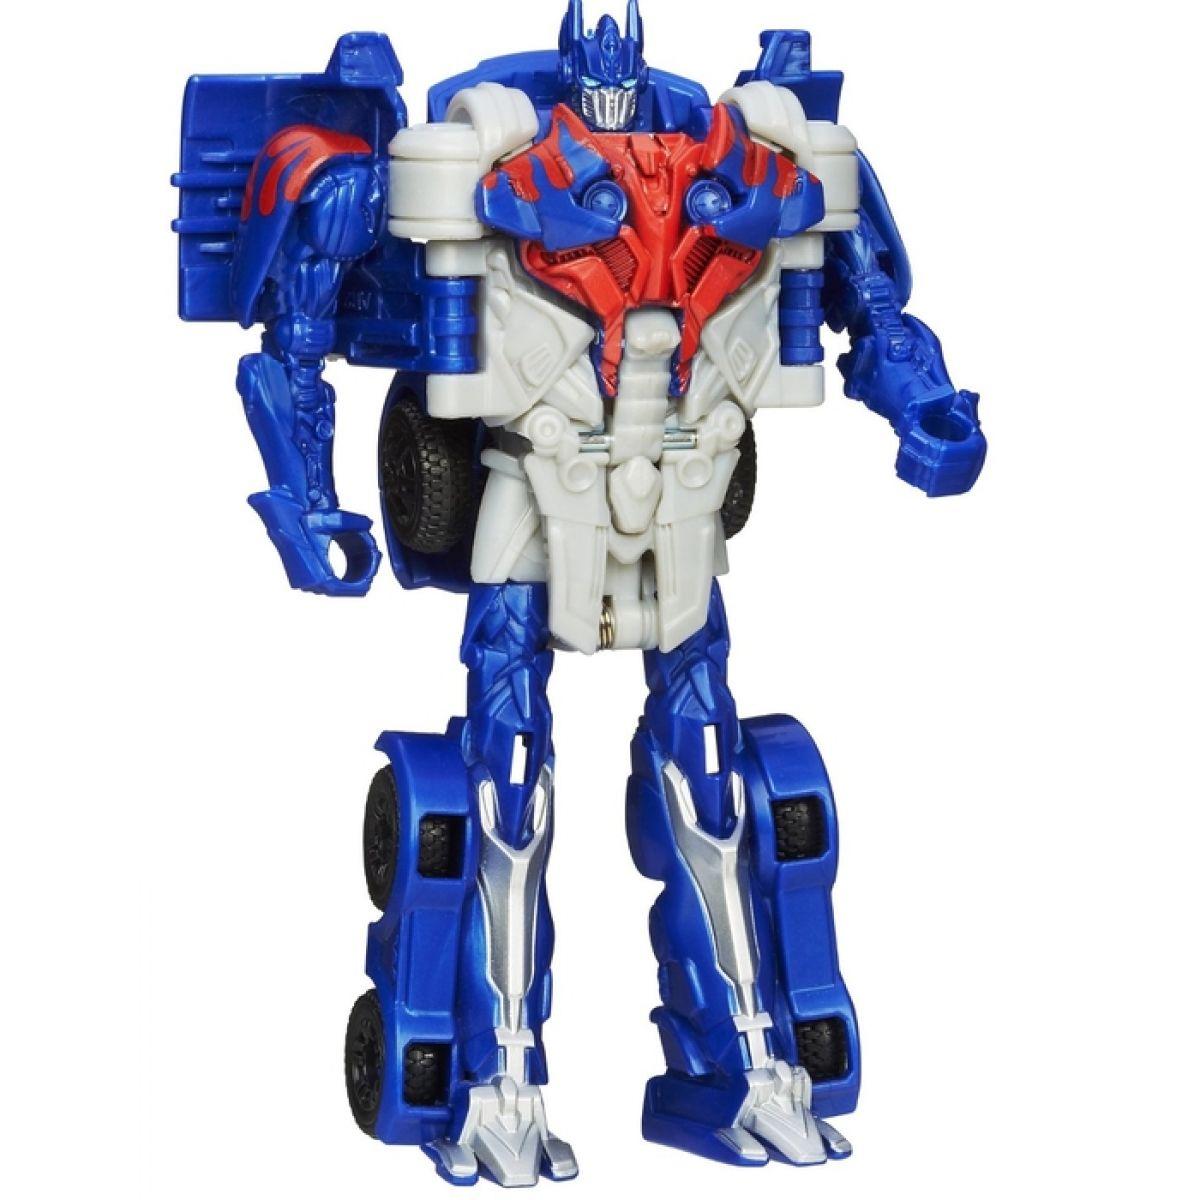 Hasbro Transformers 4 Transformace v 1 kroku - Optimus Prime